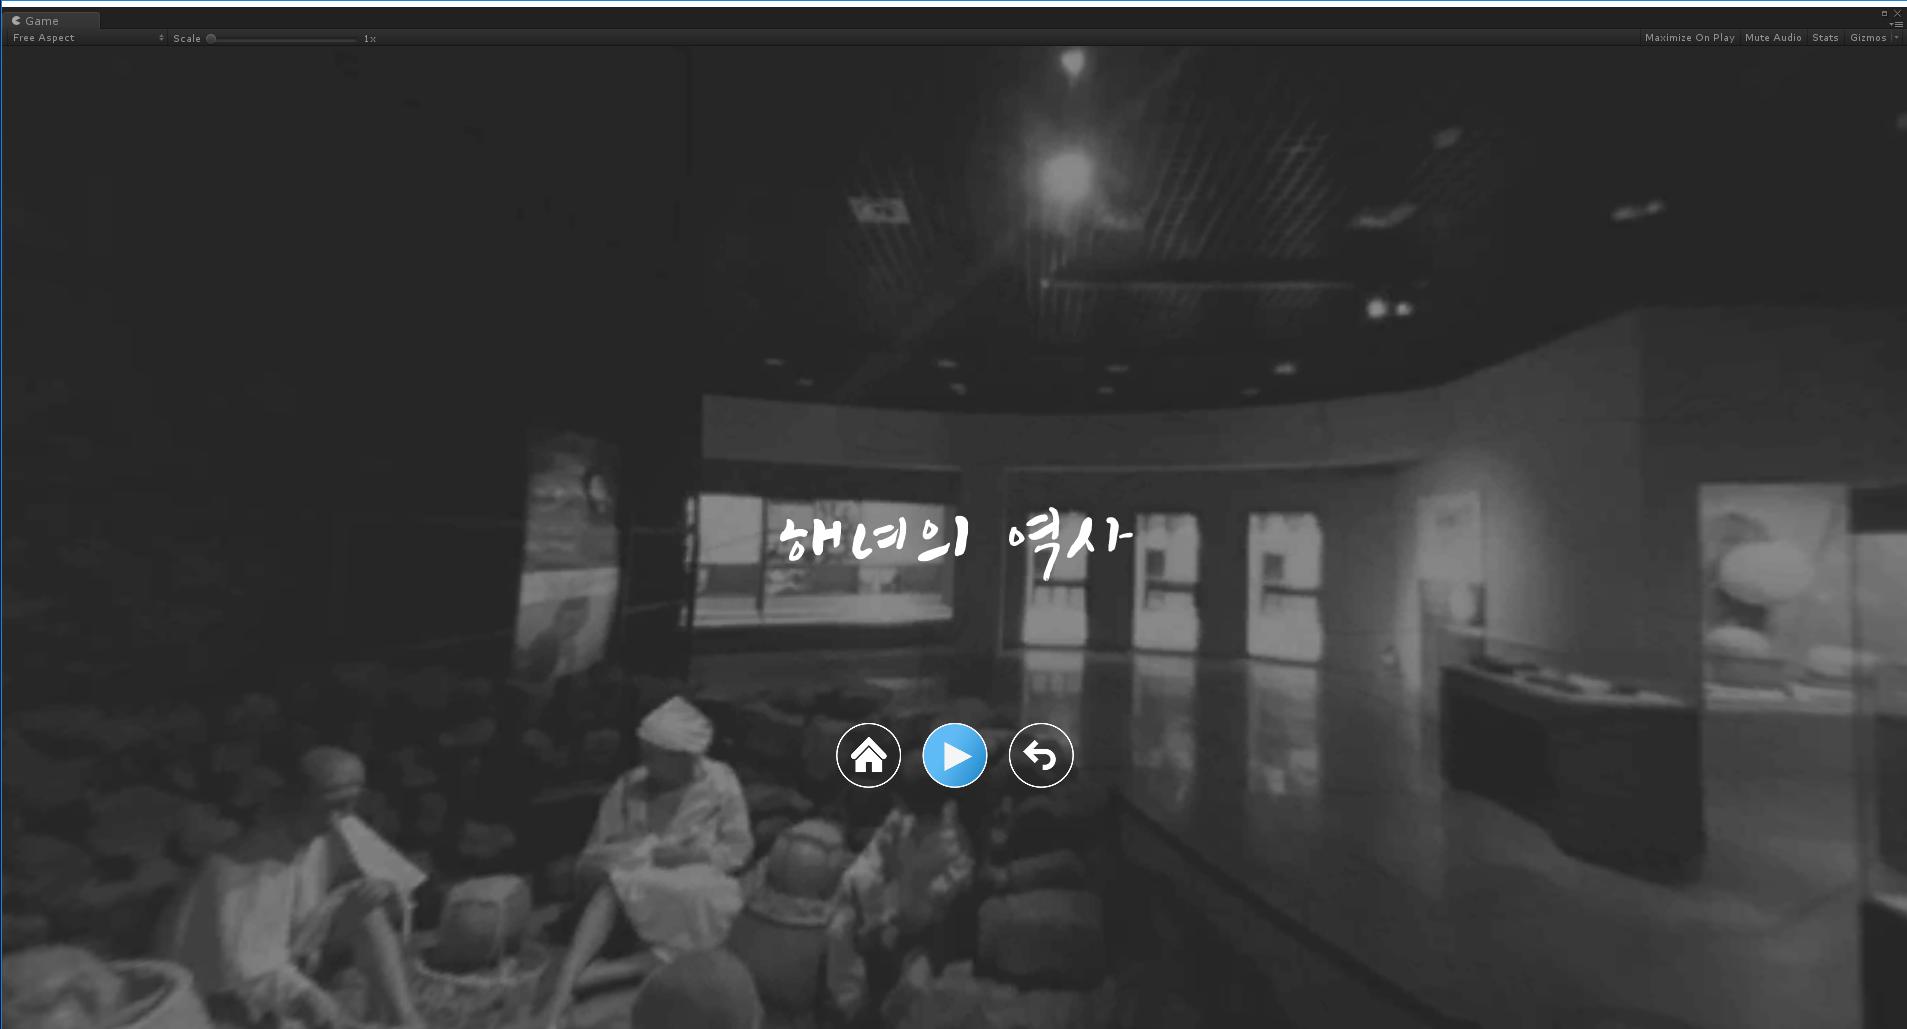 Google DayDream 플랫폼 제주 해녀 VR 다큐멘터리